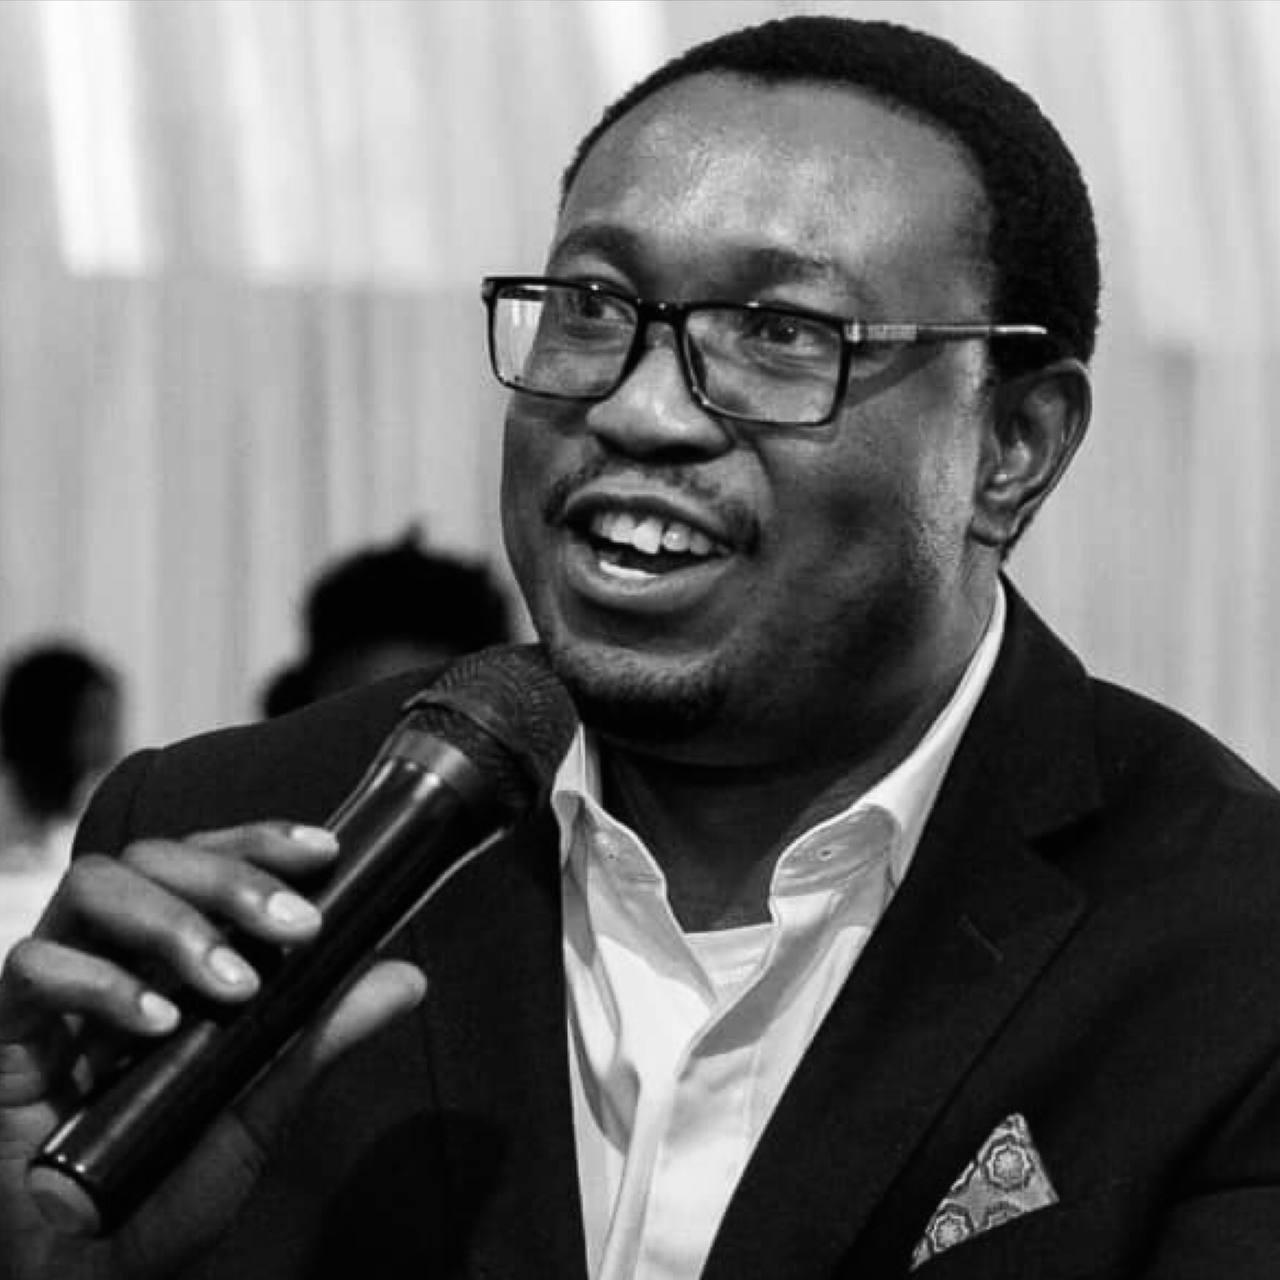 Adedeji Owonibi